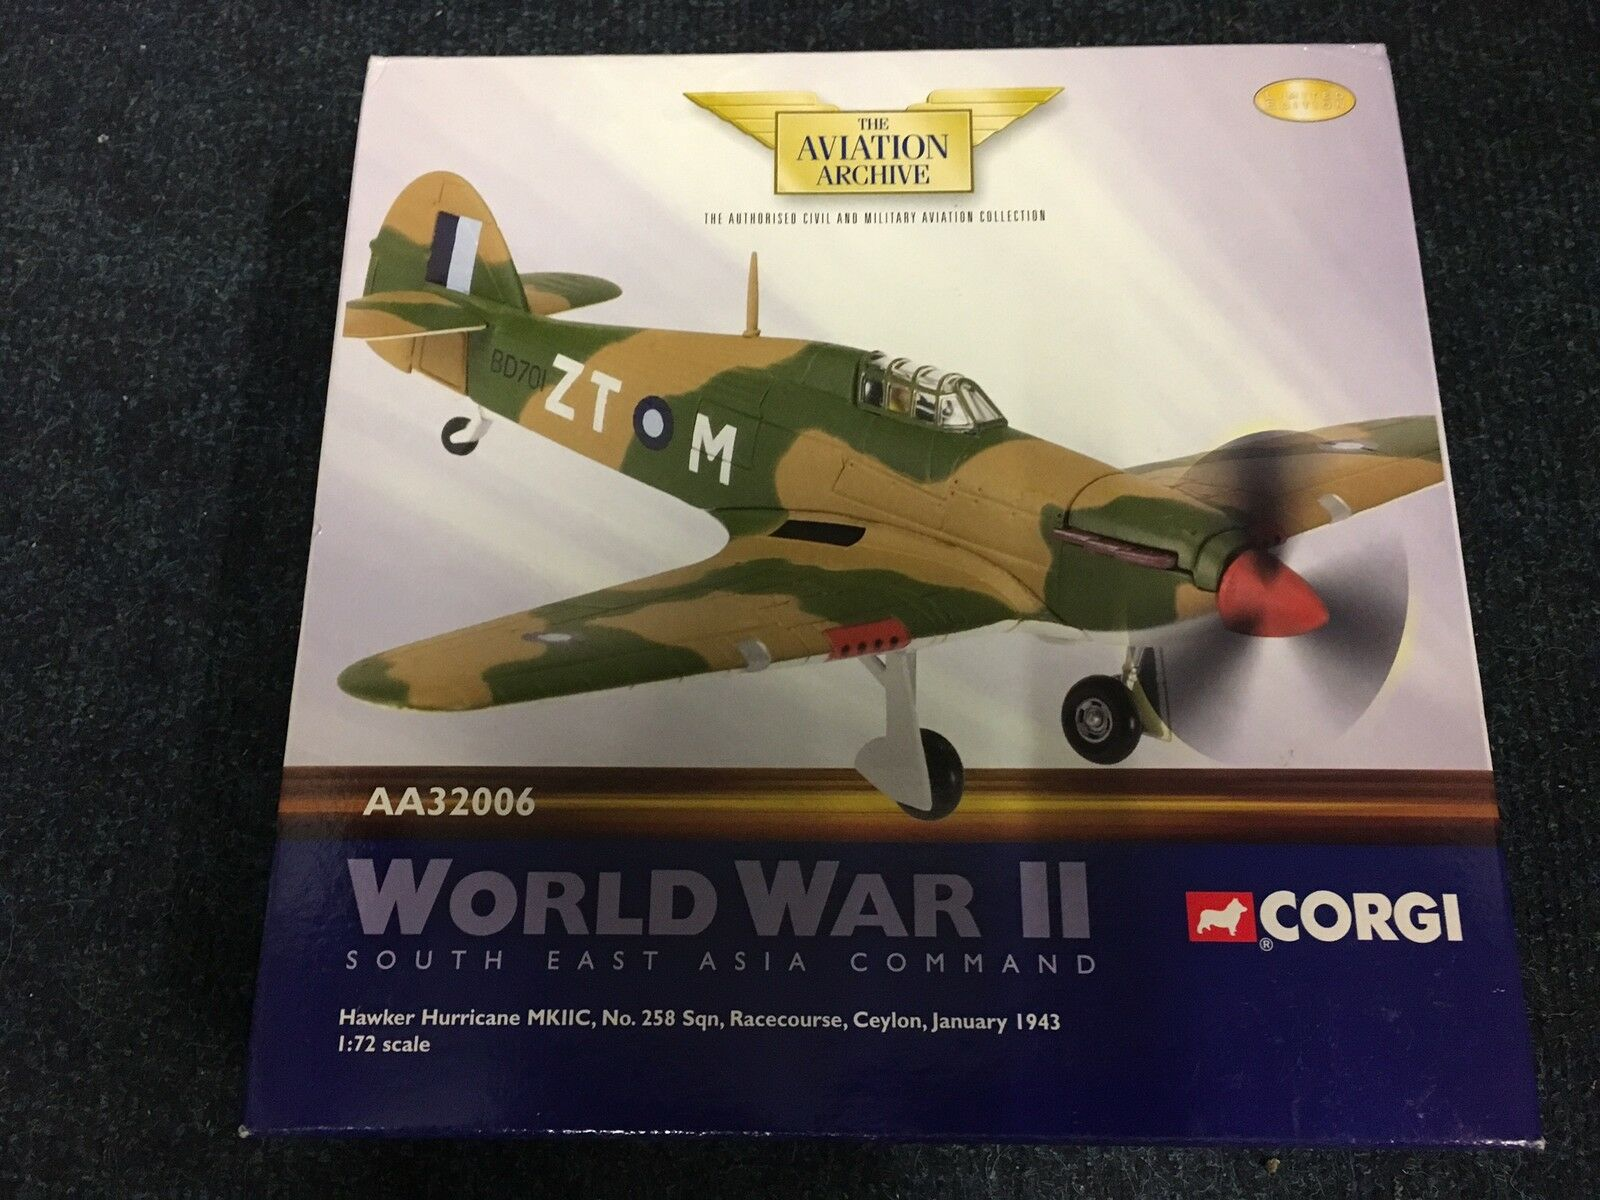 CORGI AA32006 Hawker Hurricane 258 ESC Ceylan 1945 Ltd Edition No 0002 de 2300